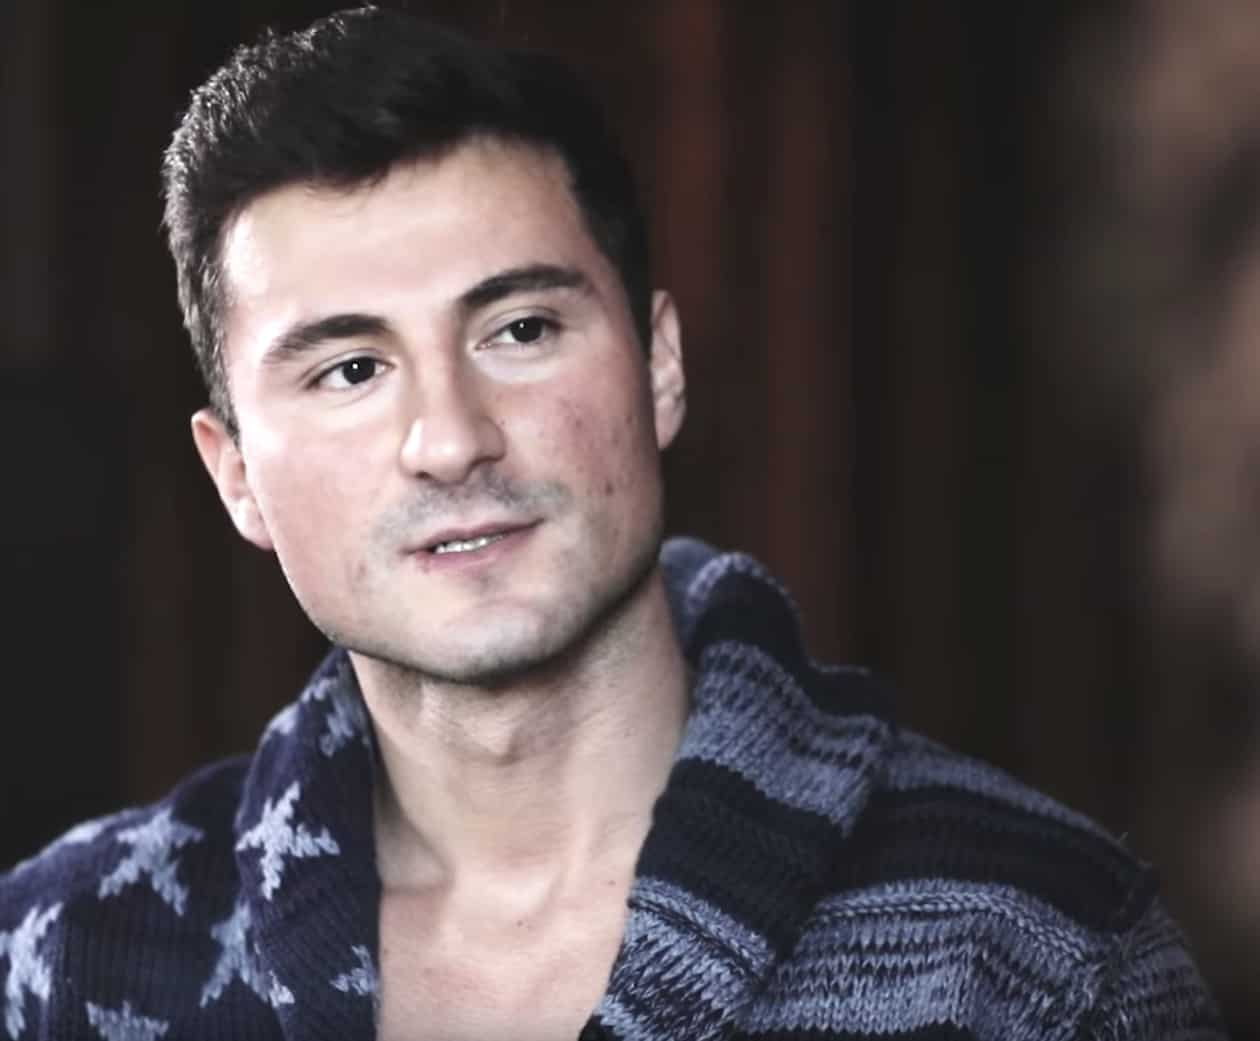 Bahtiyar Duysak